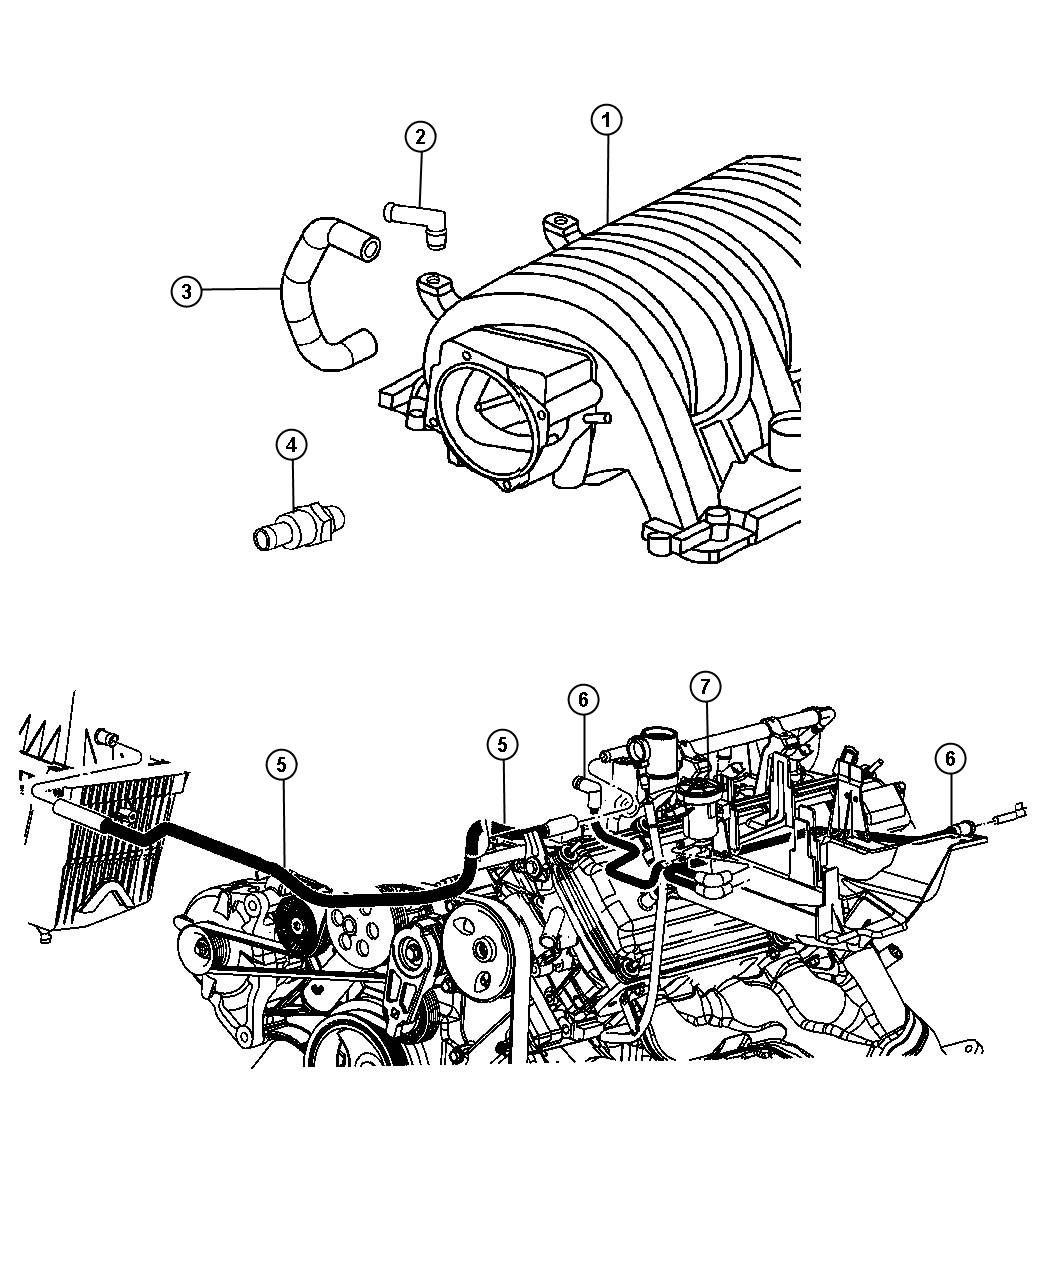 Crankcase Ventilation 6 1l 6 1l Srt Hemi Smpi V8 Engine